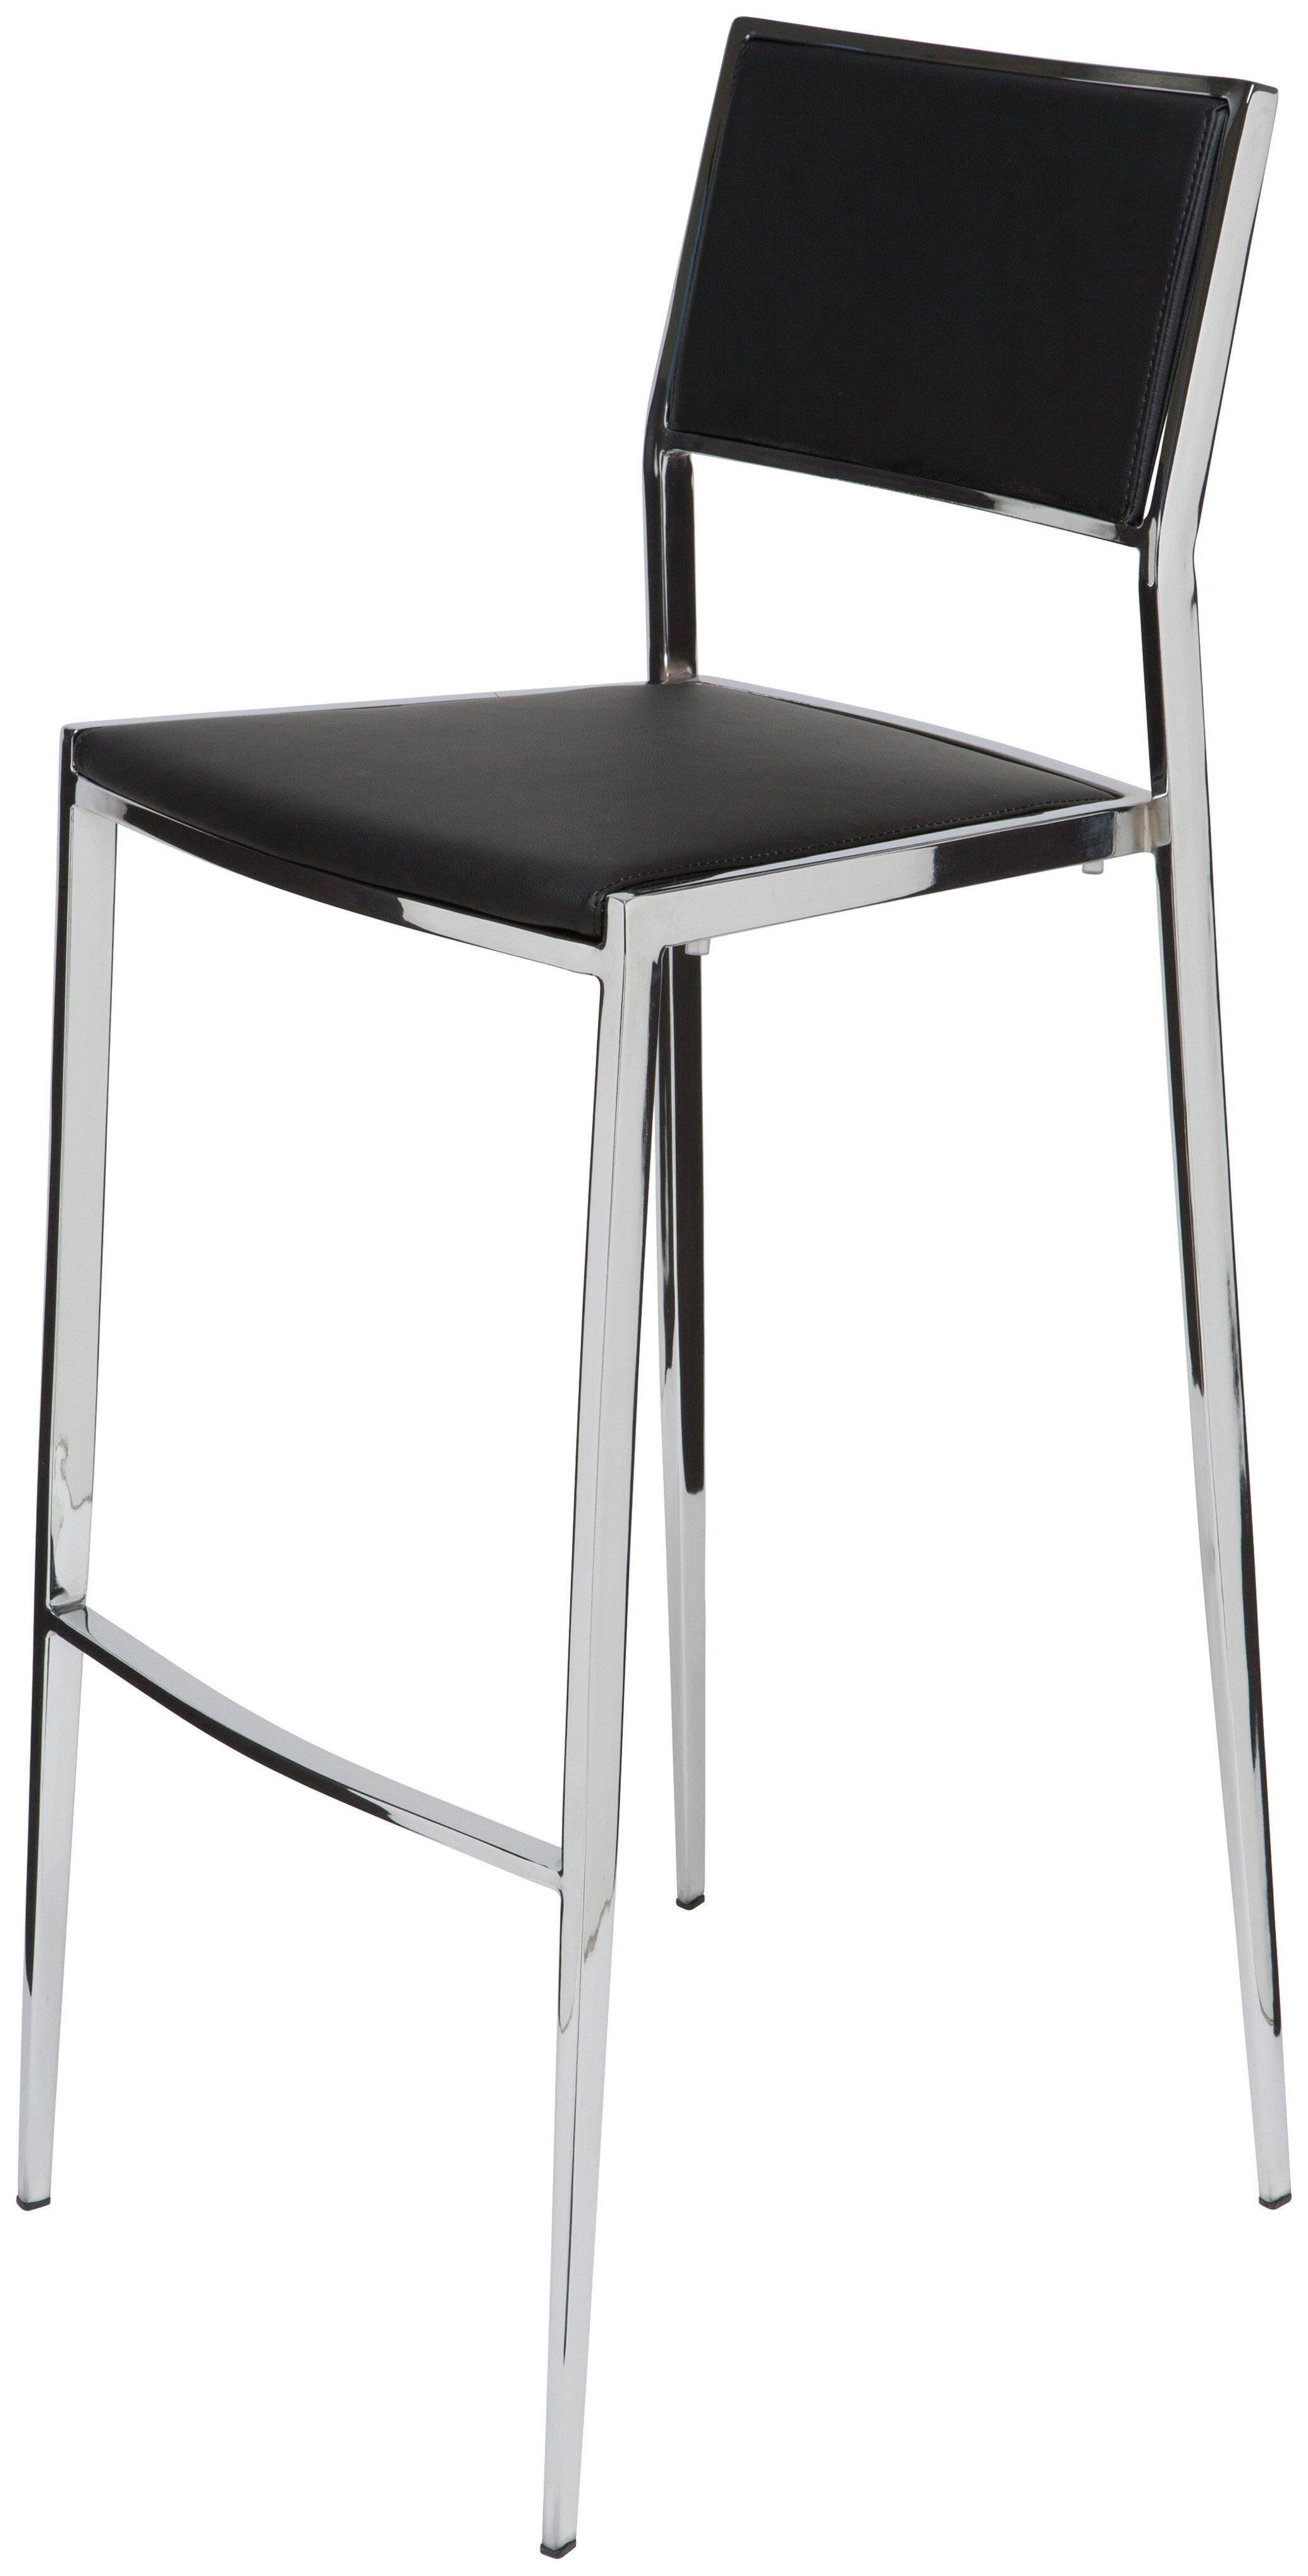 Stupendous Nuevo Aaron Bar Counter Stool Reviews Wayfair Unemploymentrelief Wooden Chair Designs For Living Room Unemploymentrelieforg